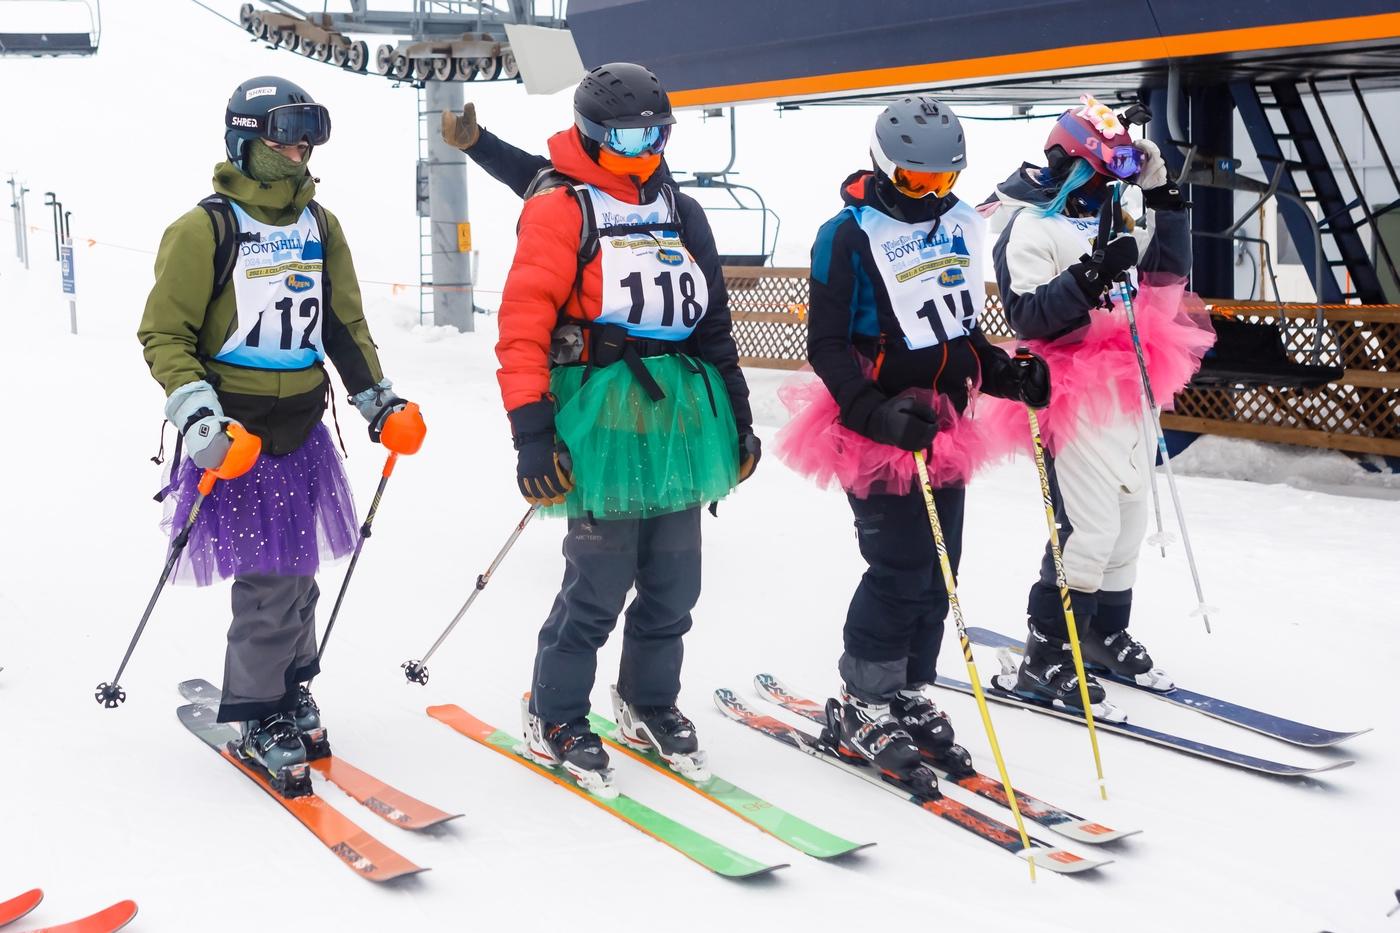 WinterKids Downhill 24 2021 SDP 2686